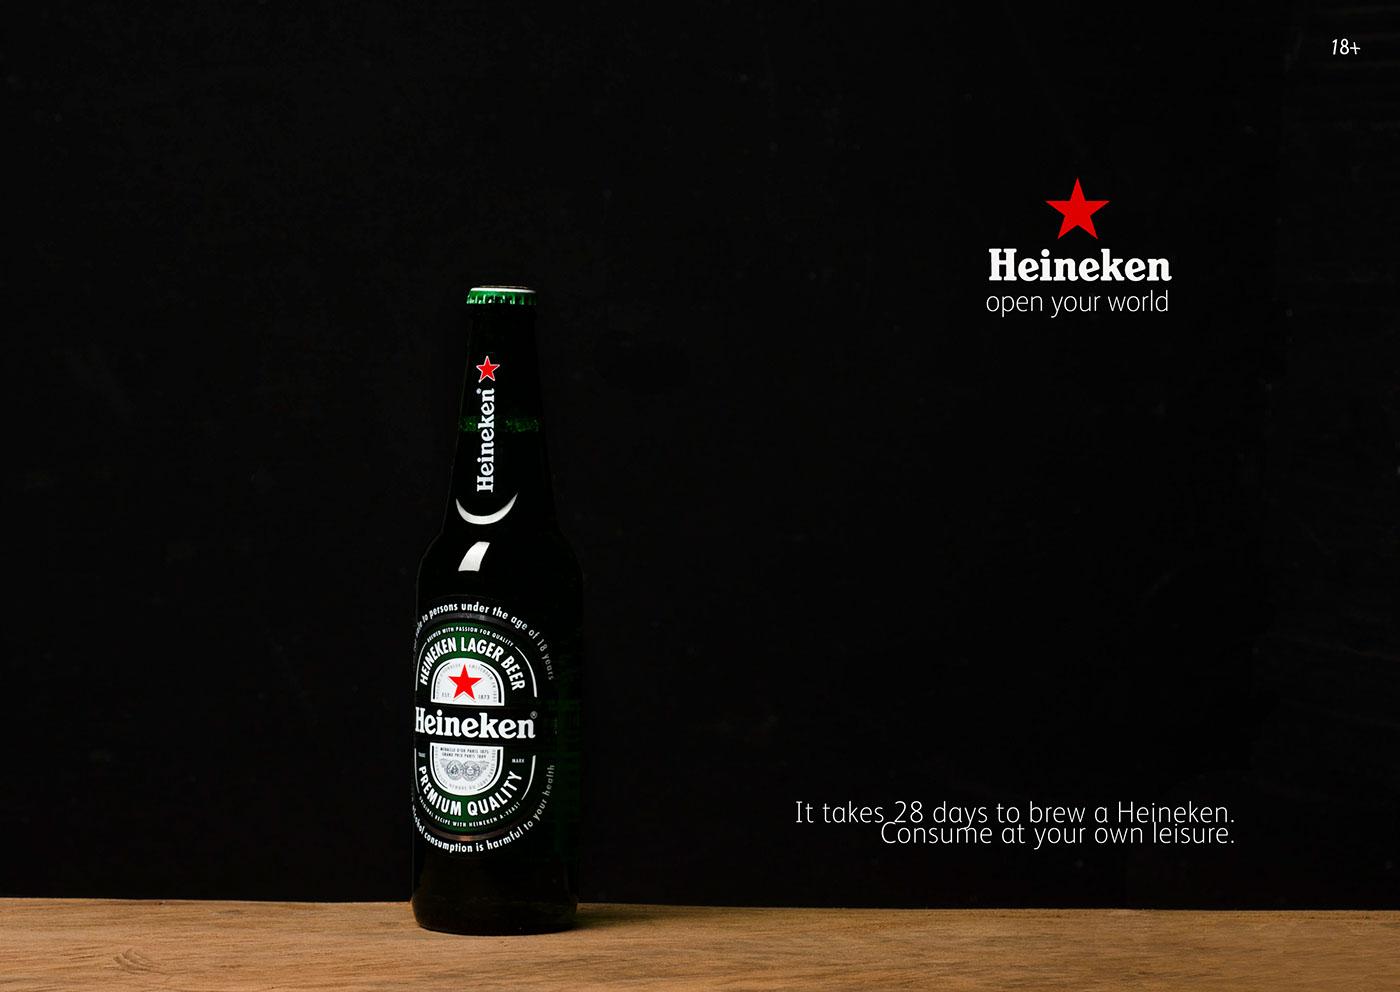 beer Advertising  campaign branding  kenya Tusker Premium Cider apple cider heineken product